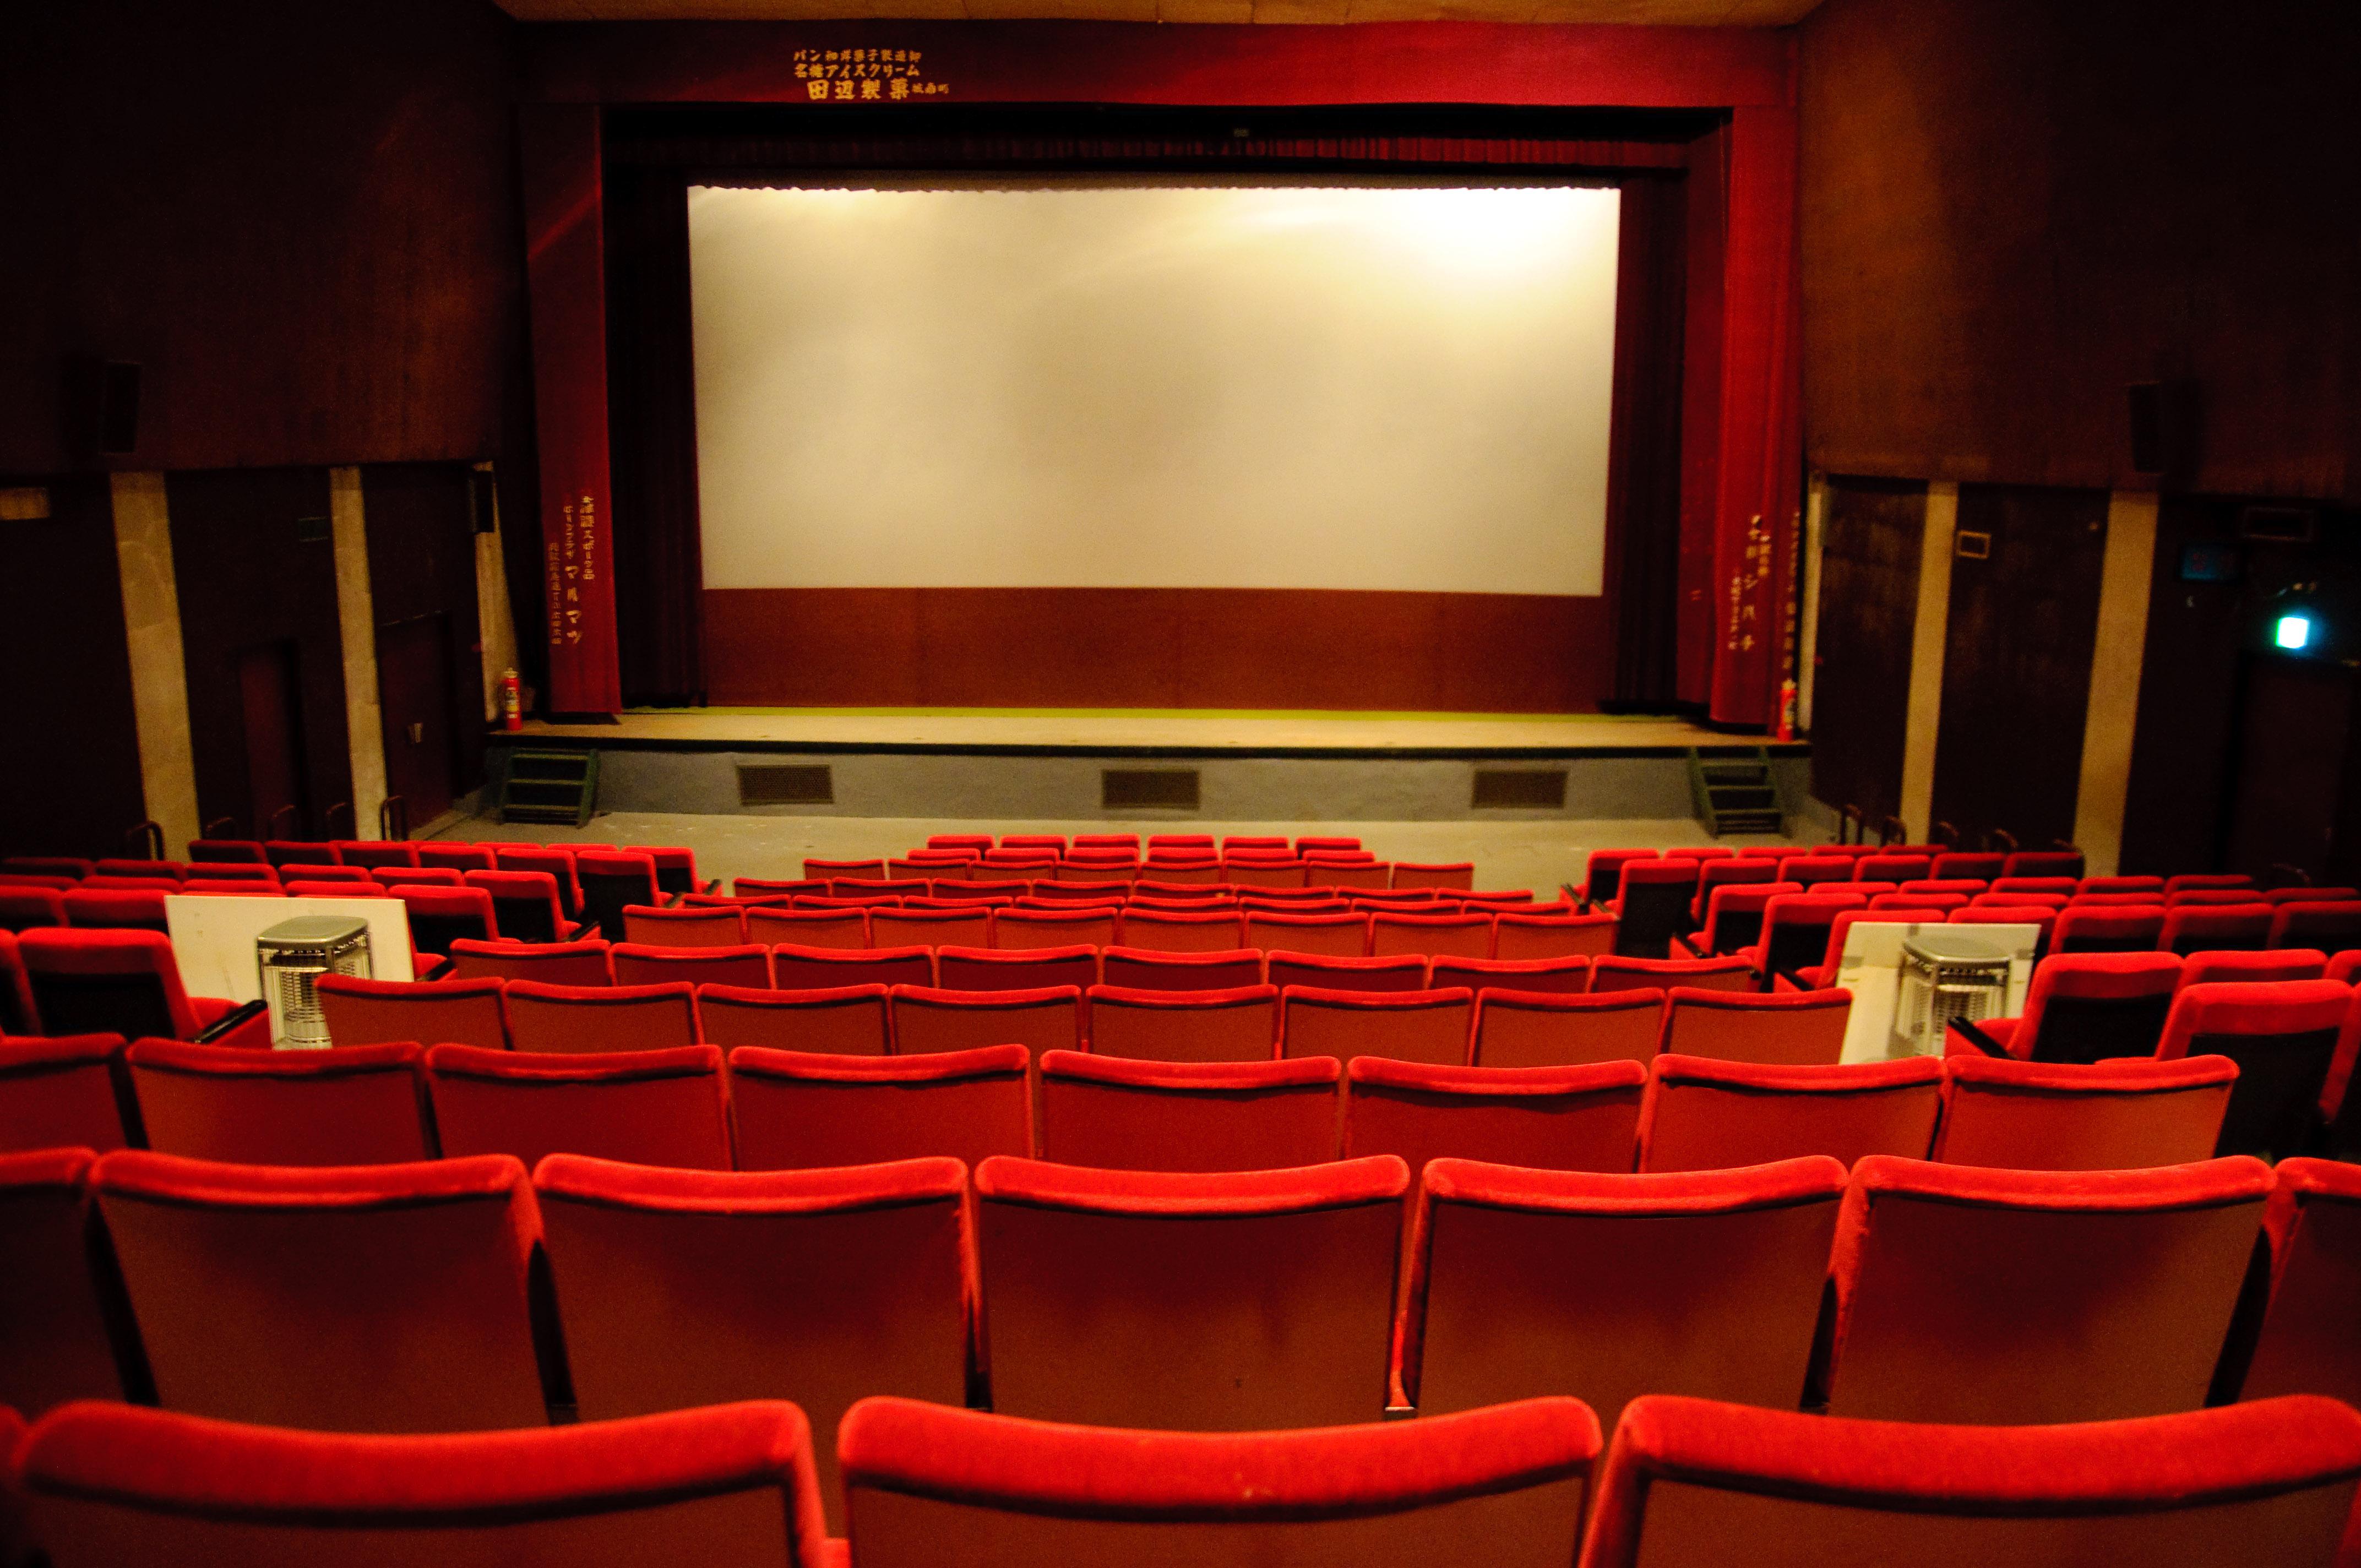 movie theater distribution